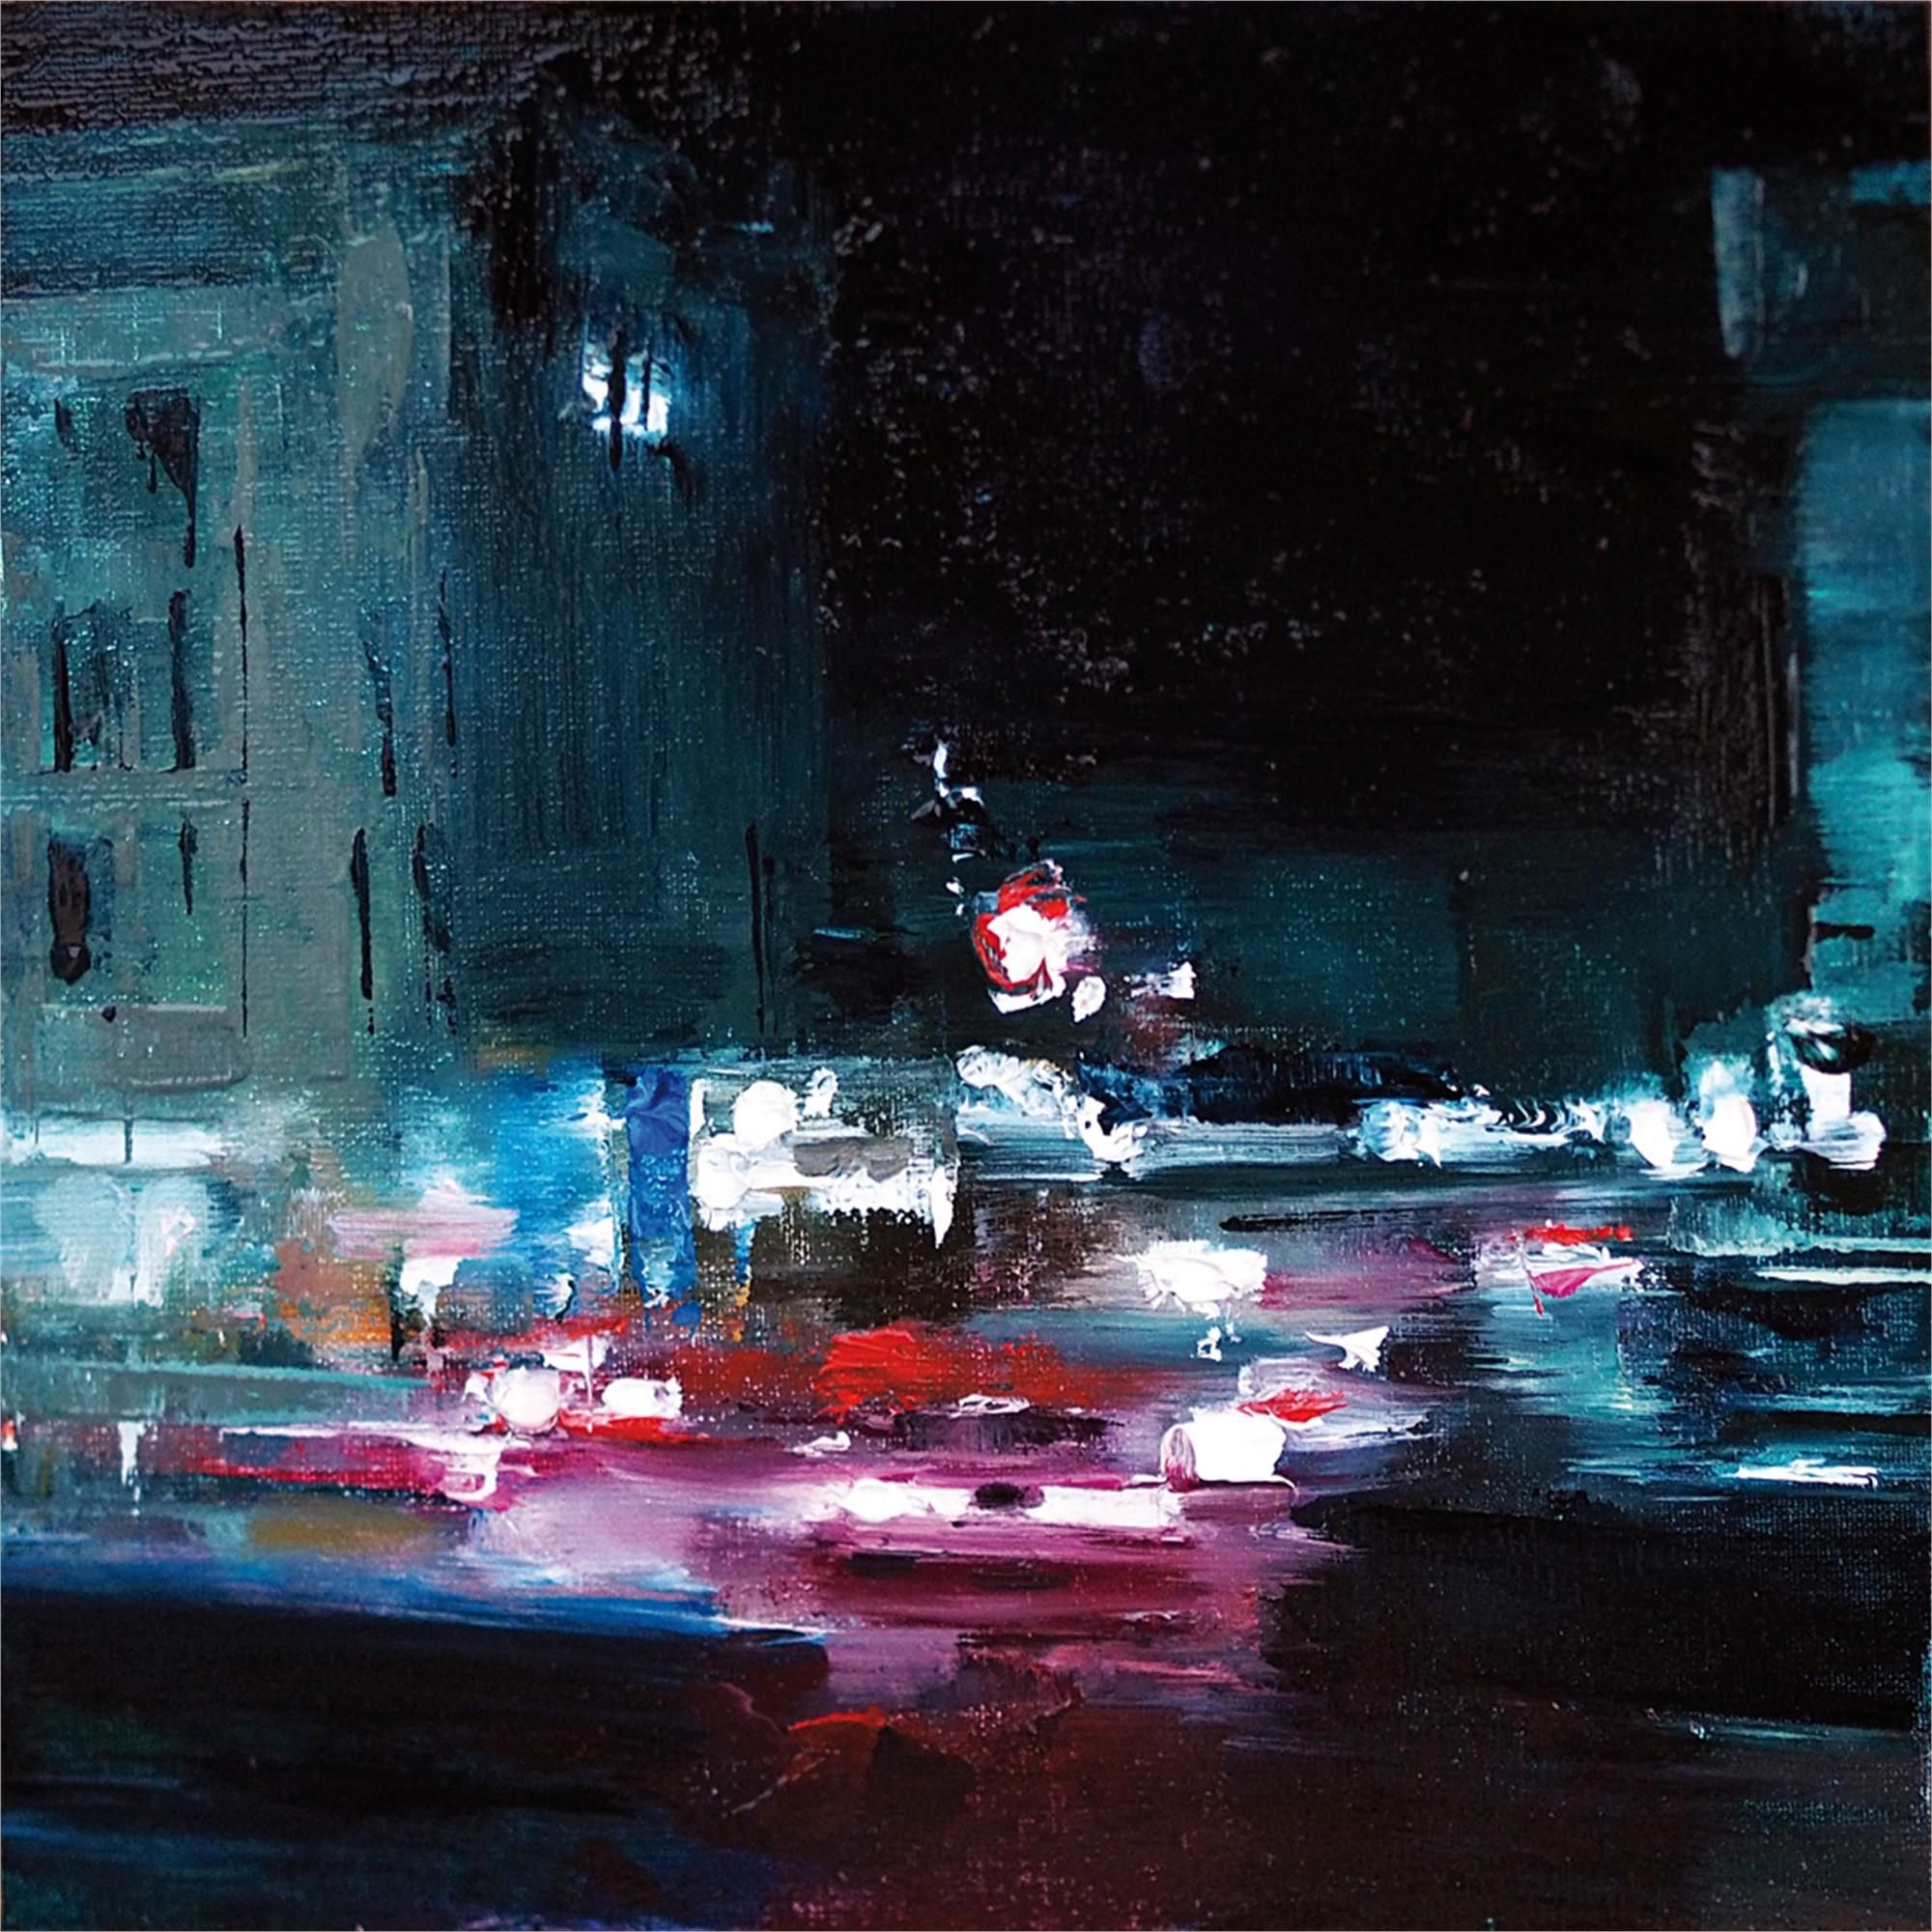 Traffic Study I by Heiko Mattausch